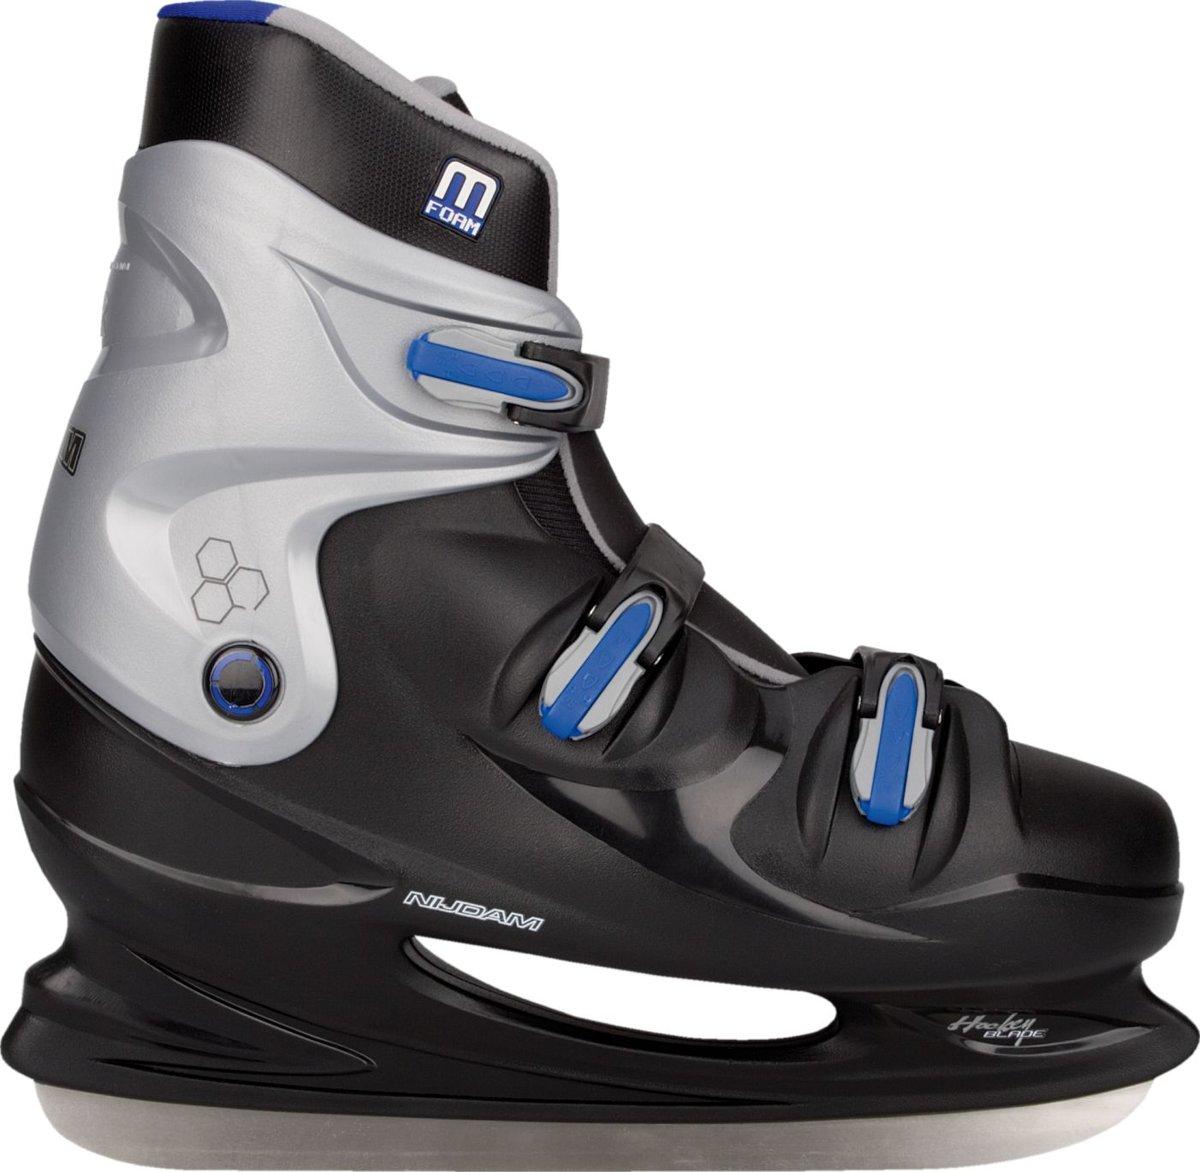 Nijdam 0099 IJshockeyschaats XXL - Hardboot - Zwart/Blauw - Maat 49